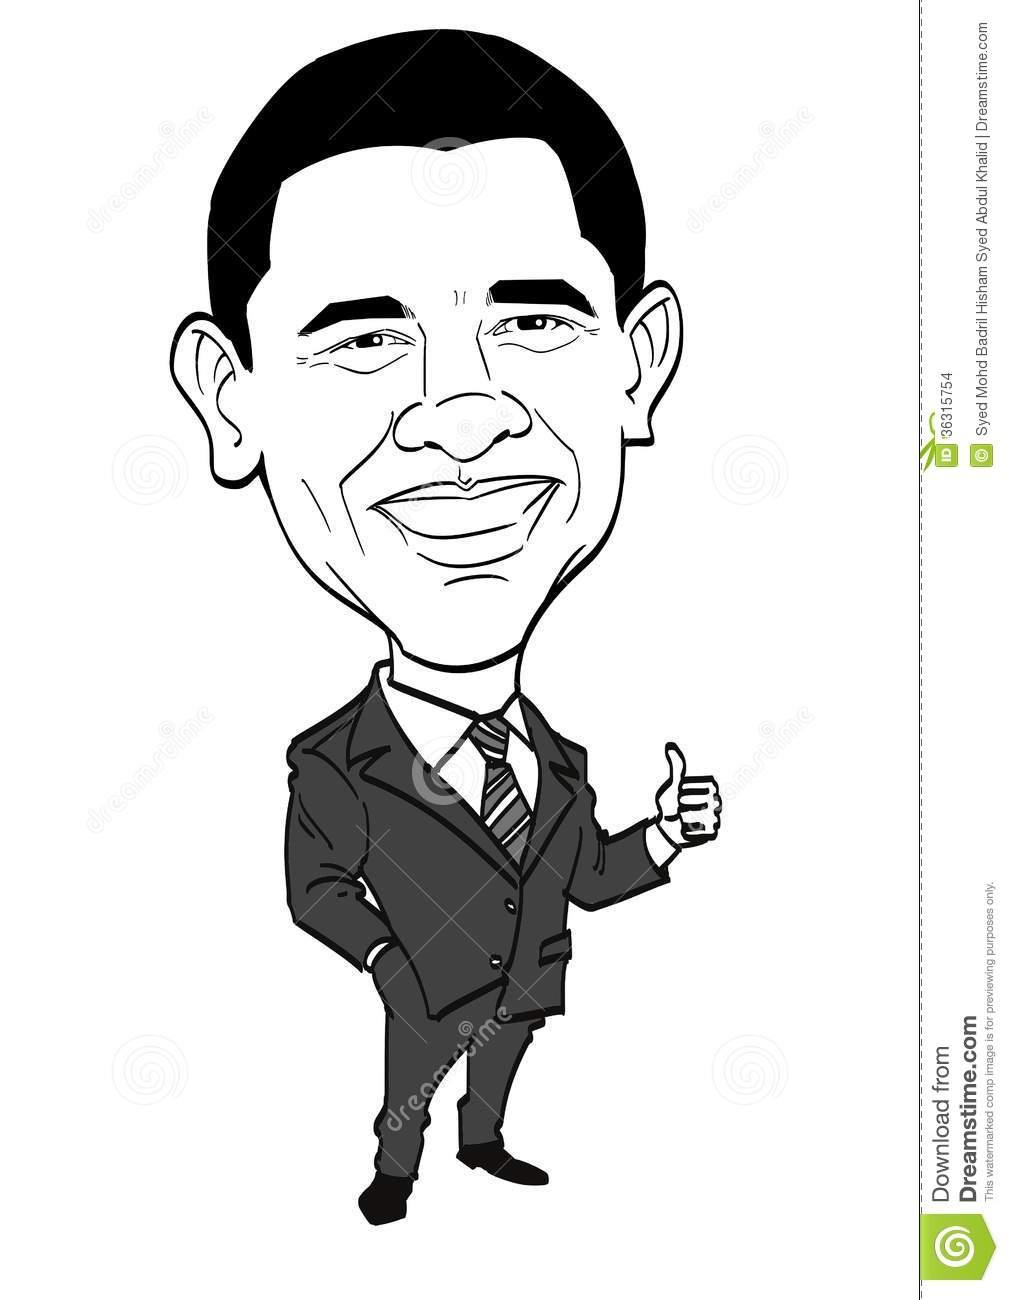 President obama clipart.